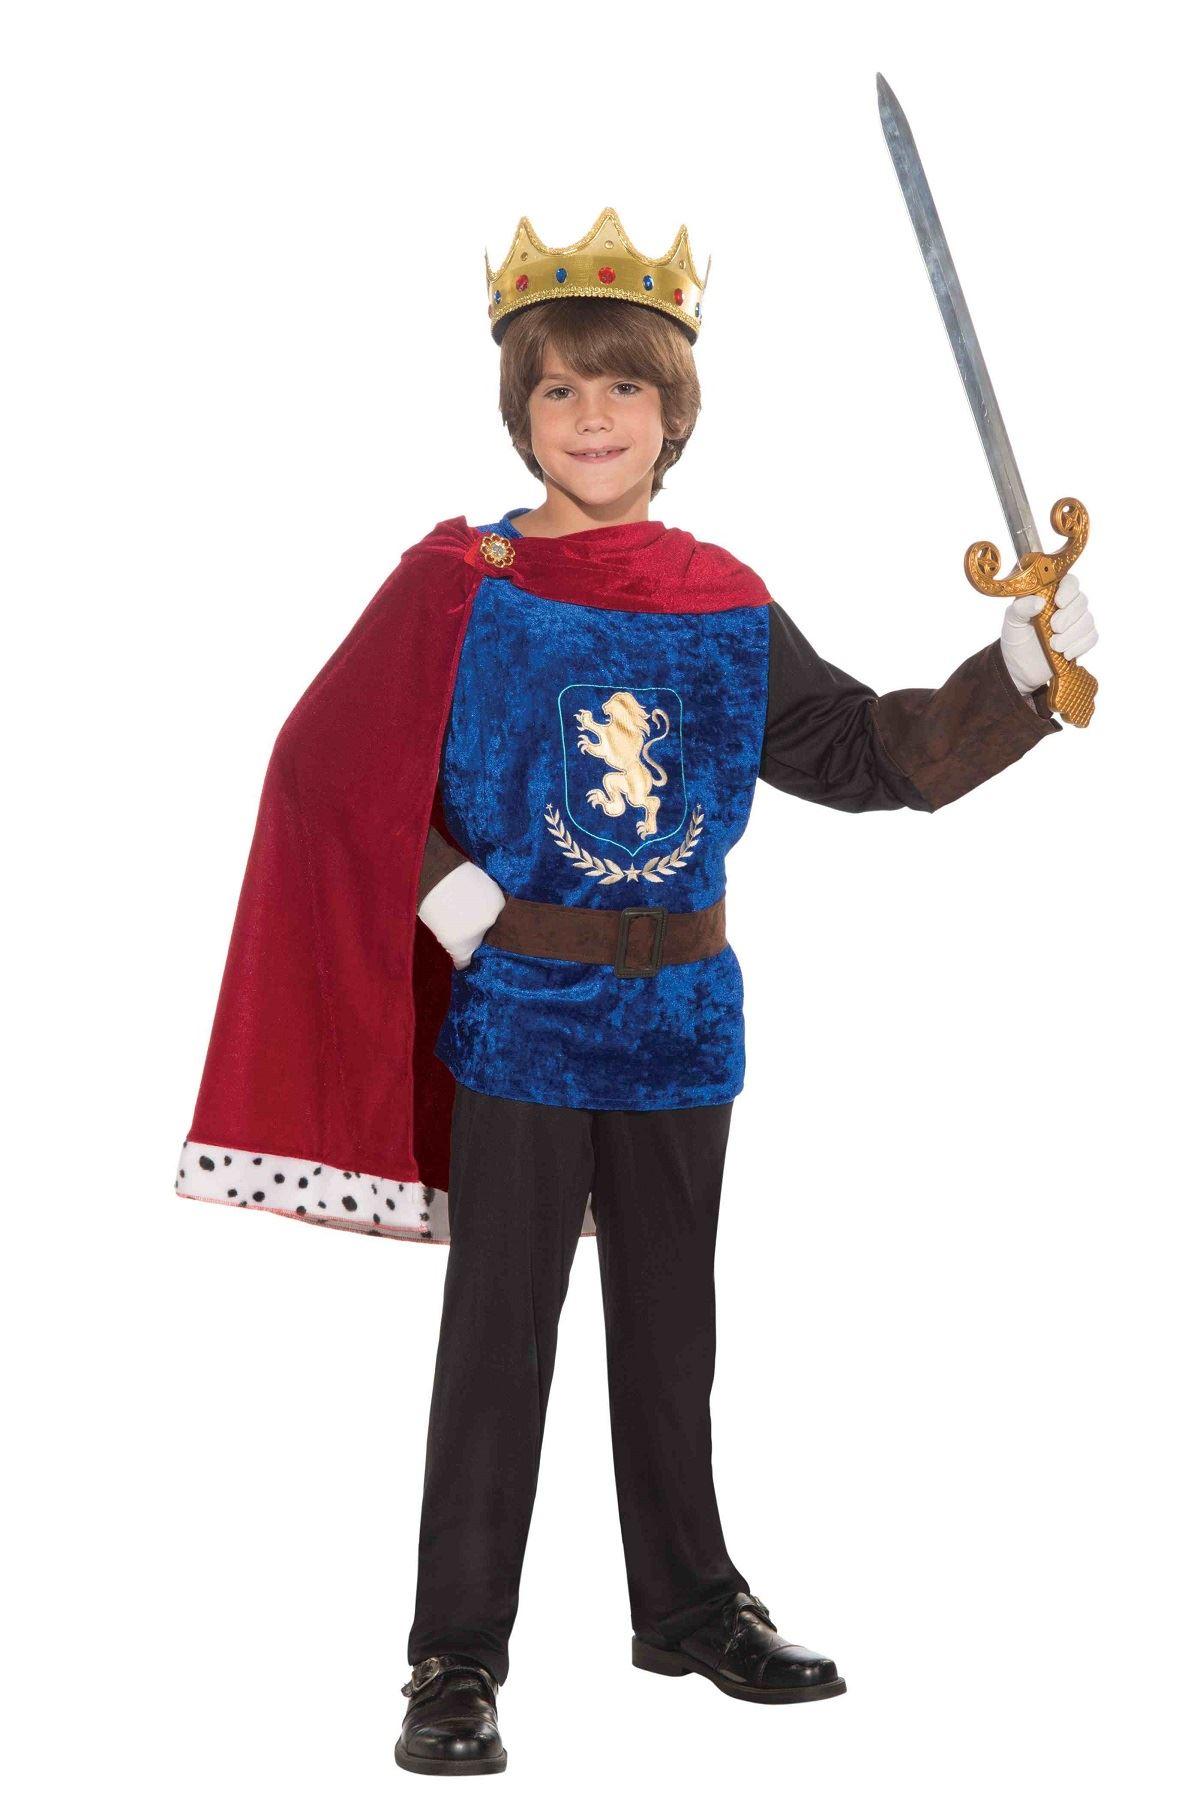 Kids Prince Charming Boys Costume  sc 1 st  The Costume Land & Kids Prince Charming Boys Costume | $22.99 | The Costume Land